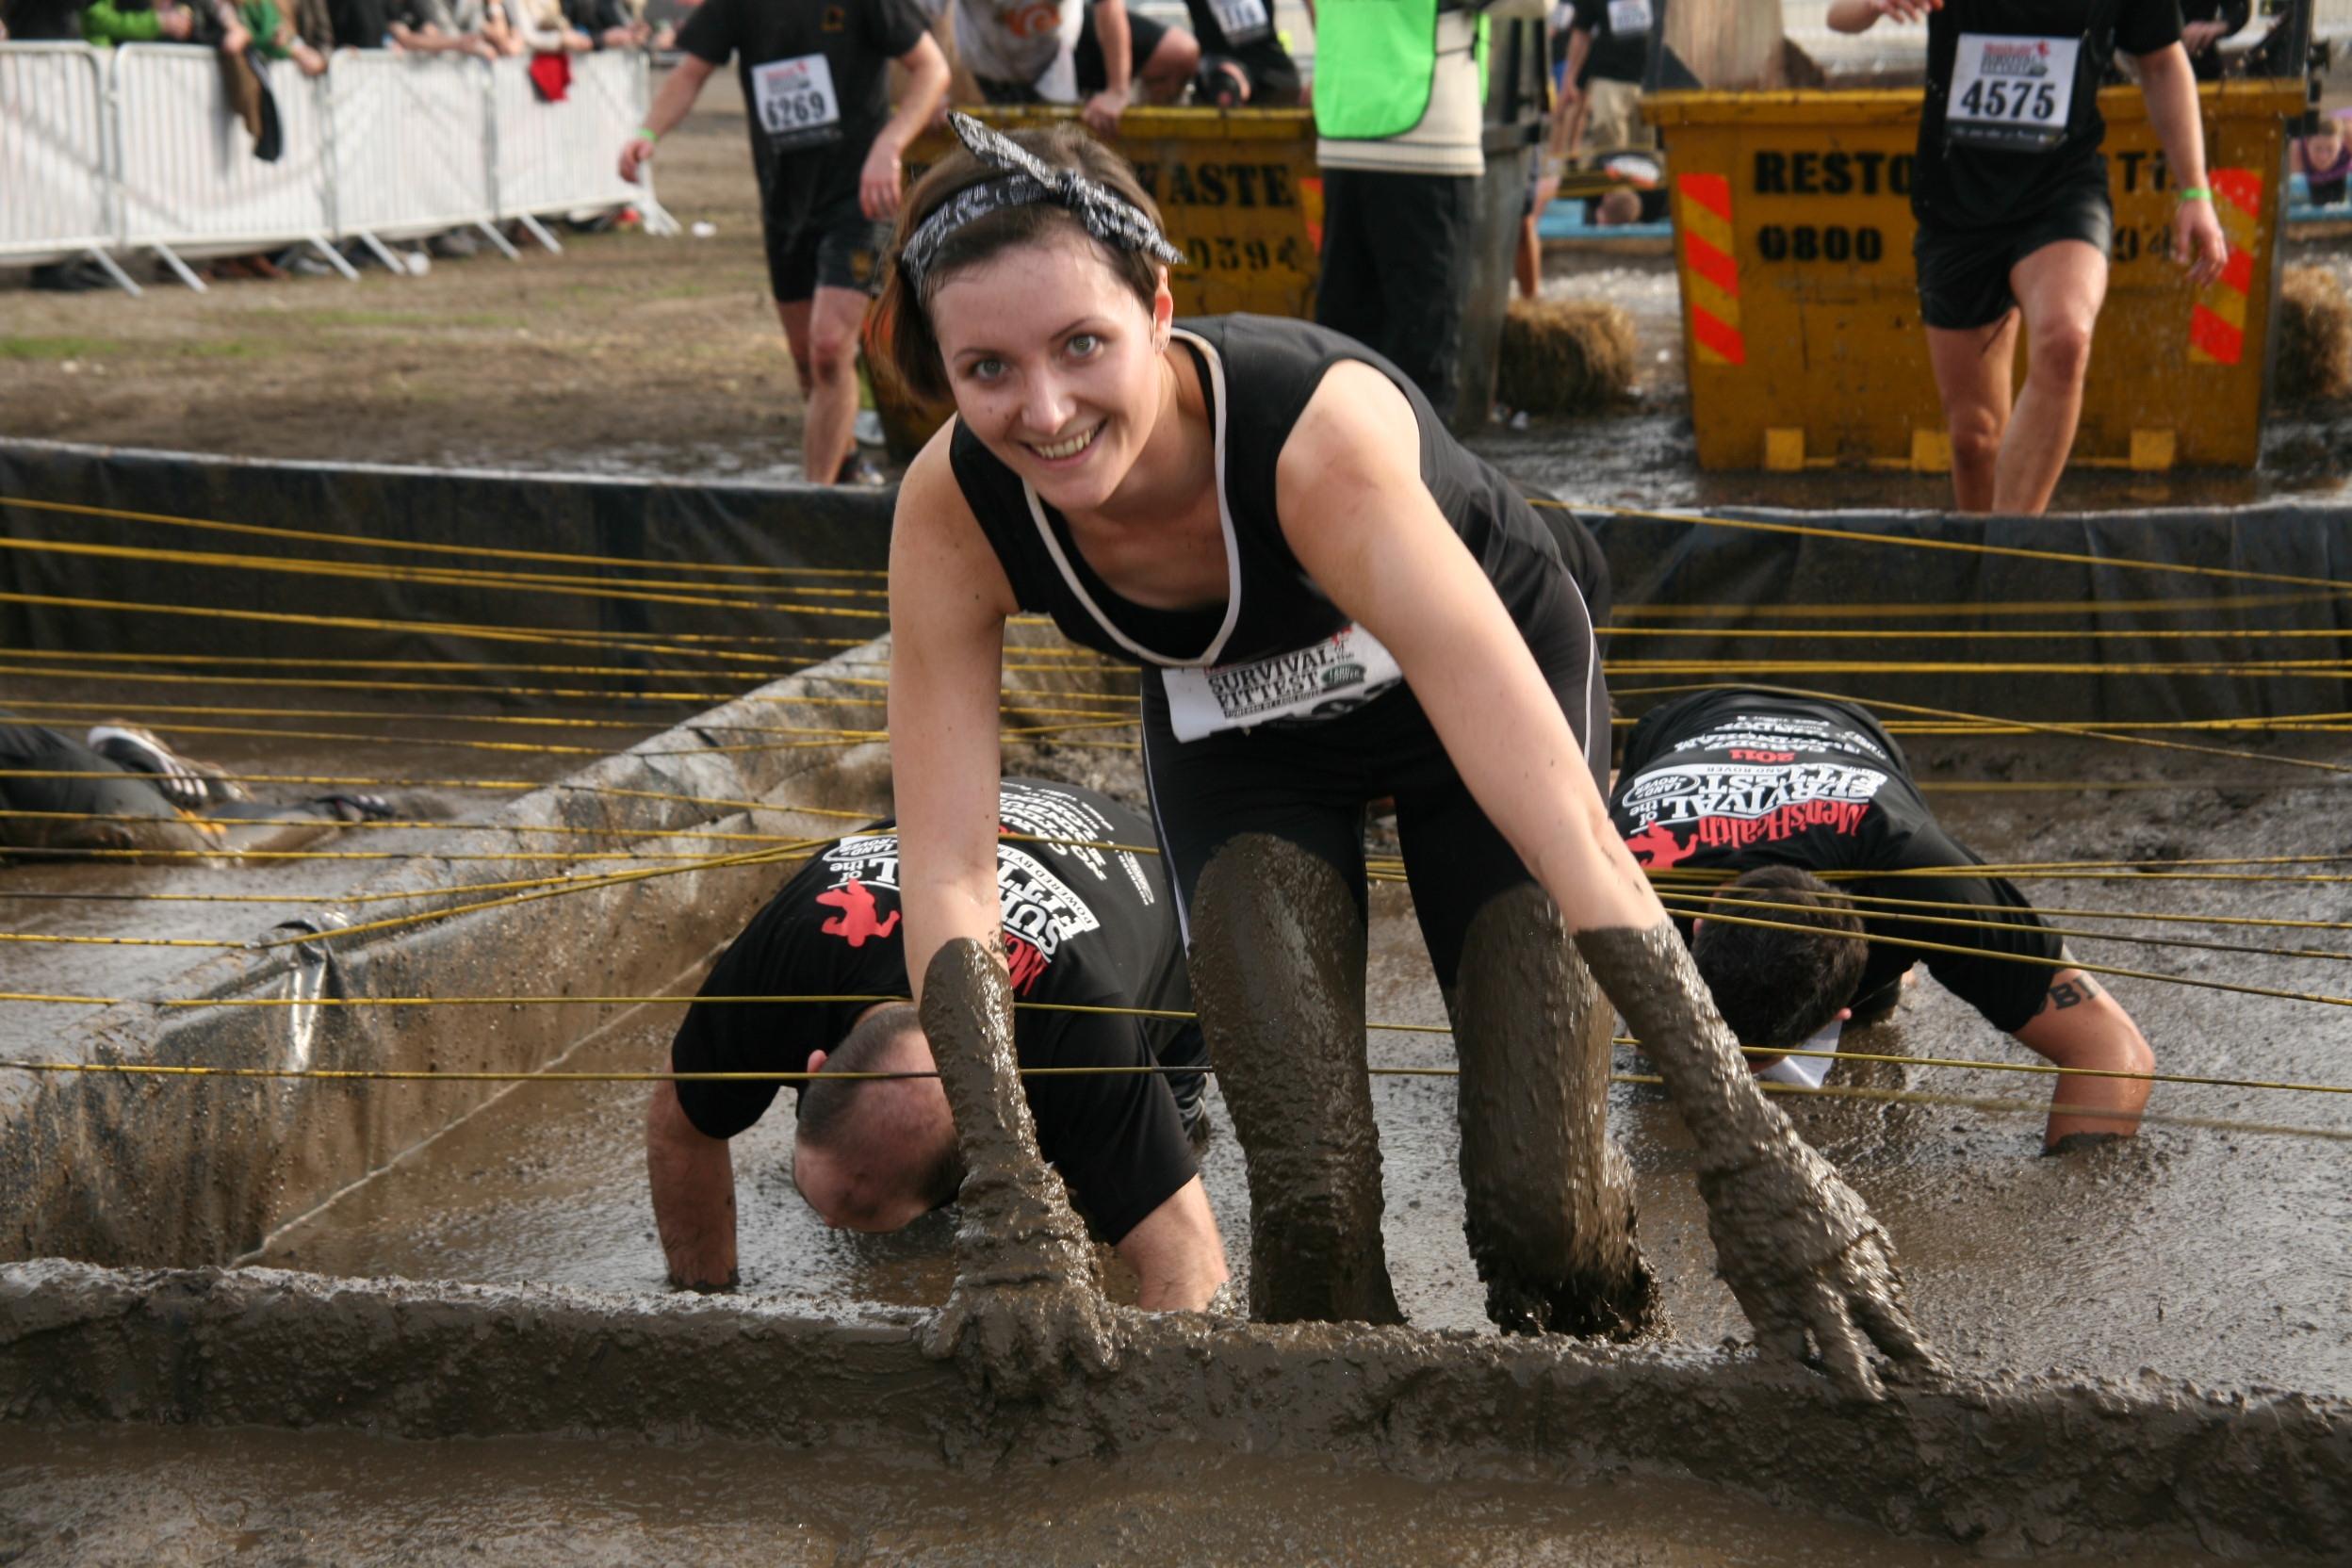 Men's Health Mud Crawl